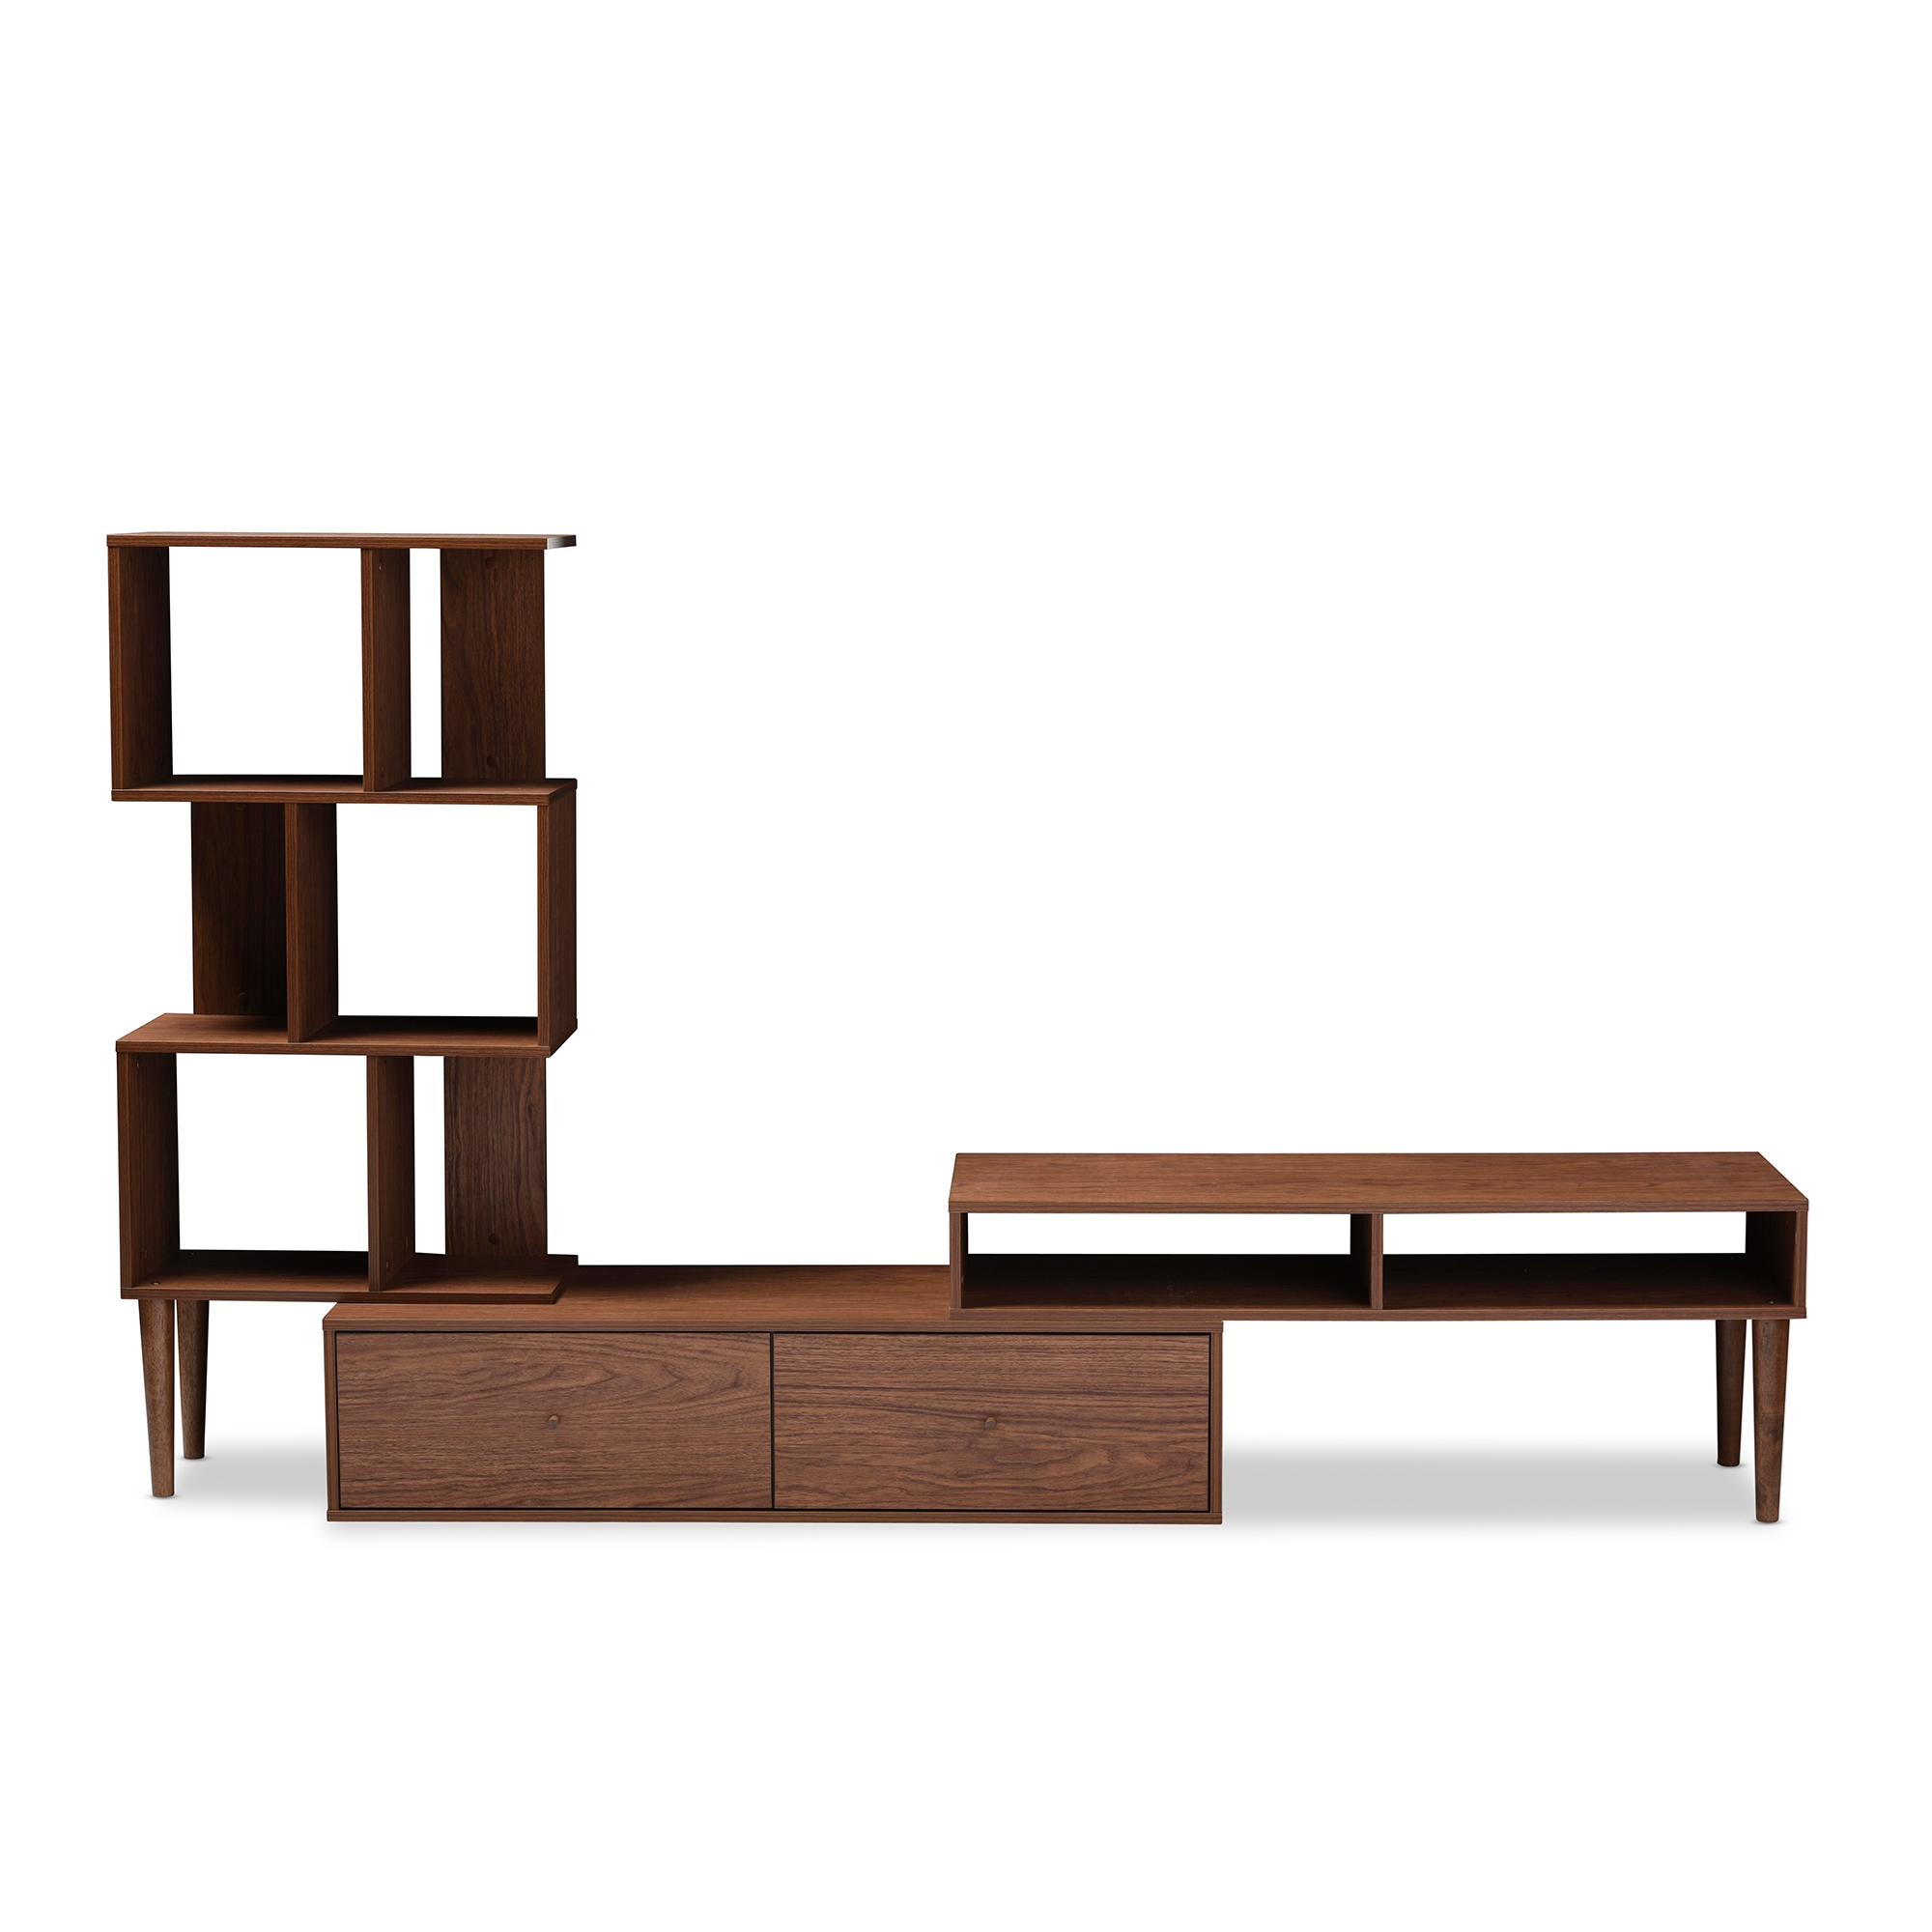 baxton studio haversham mid century retro modern tv stand entertainment center and display unit. Black Bedroom Furniture Sets. Home Design Ideas